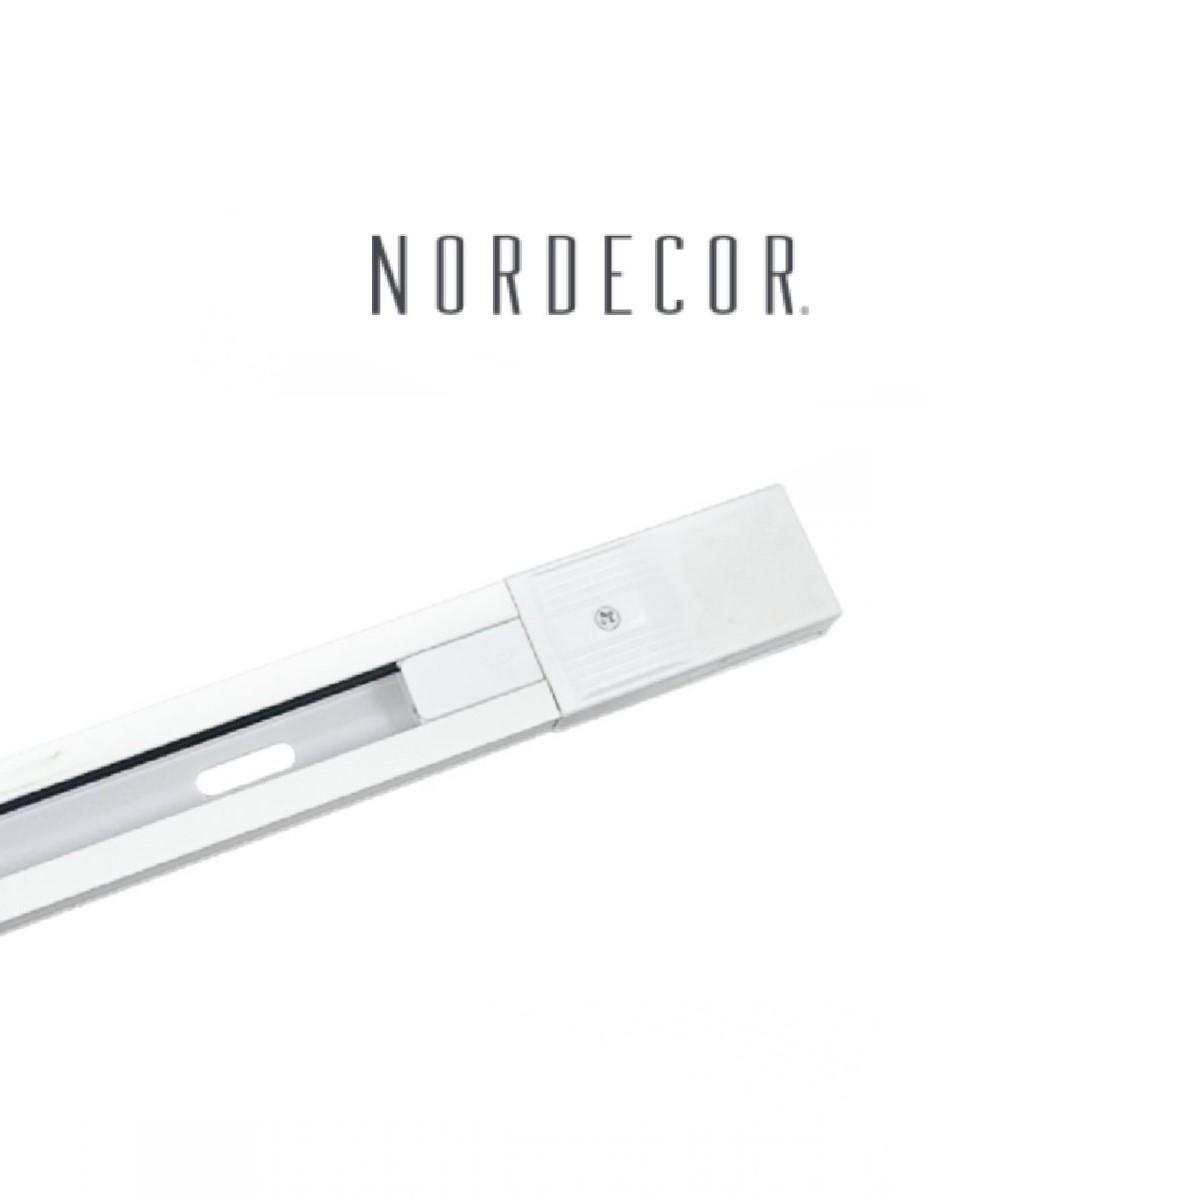 Trilho Eletrificado 2m Branco Para Spots Eletrificado Nordecor 6056